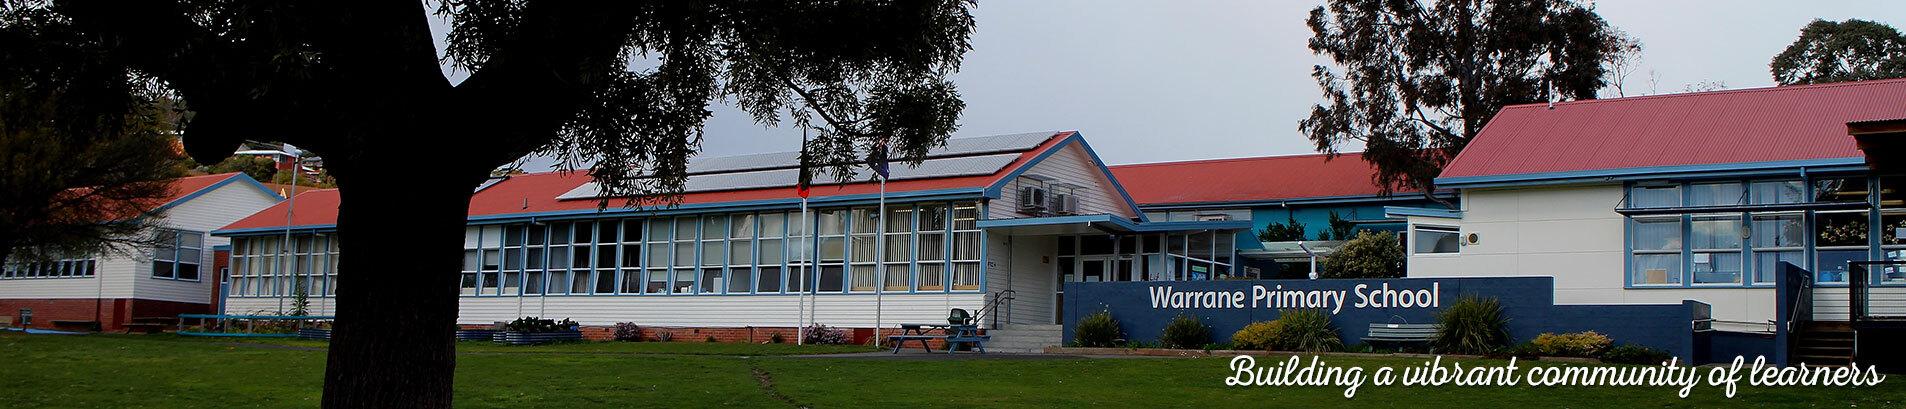 School Slider Image Two